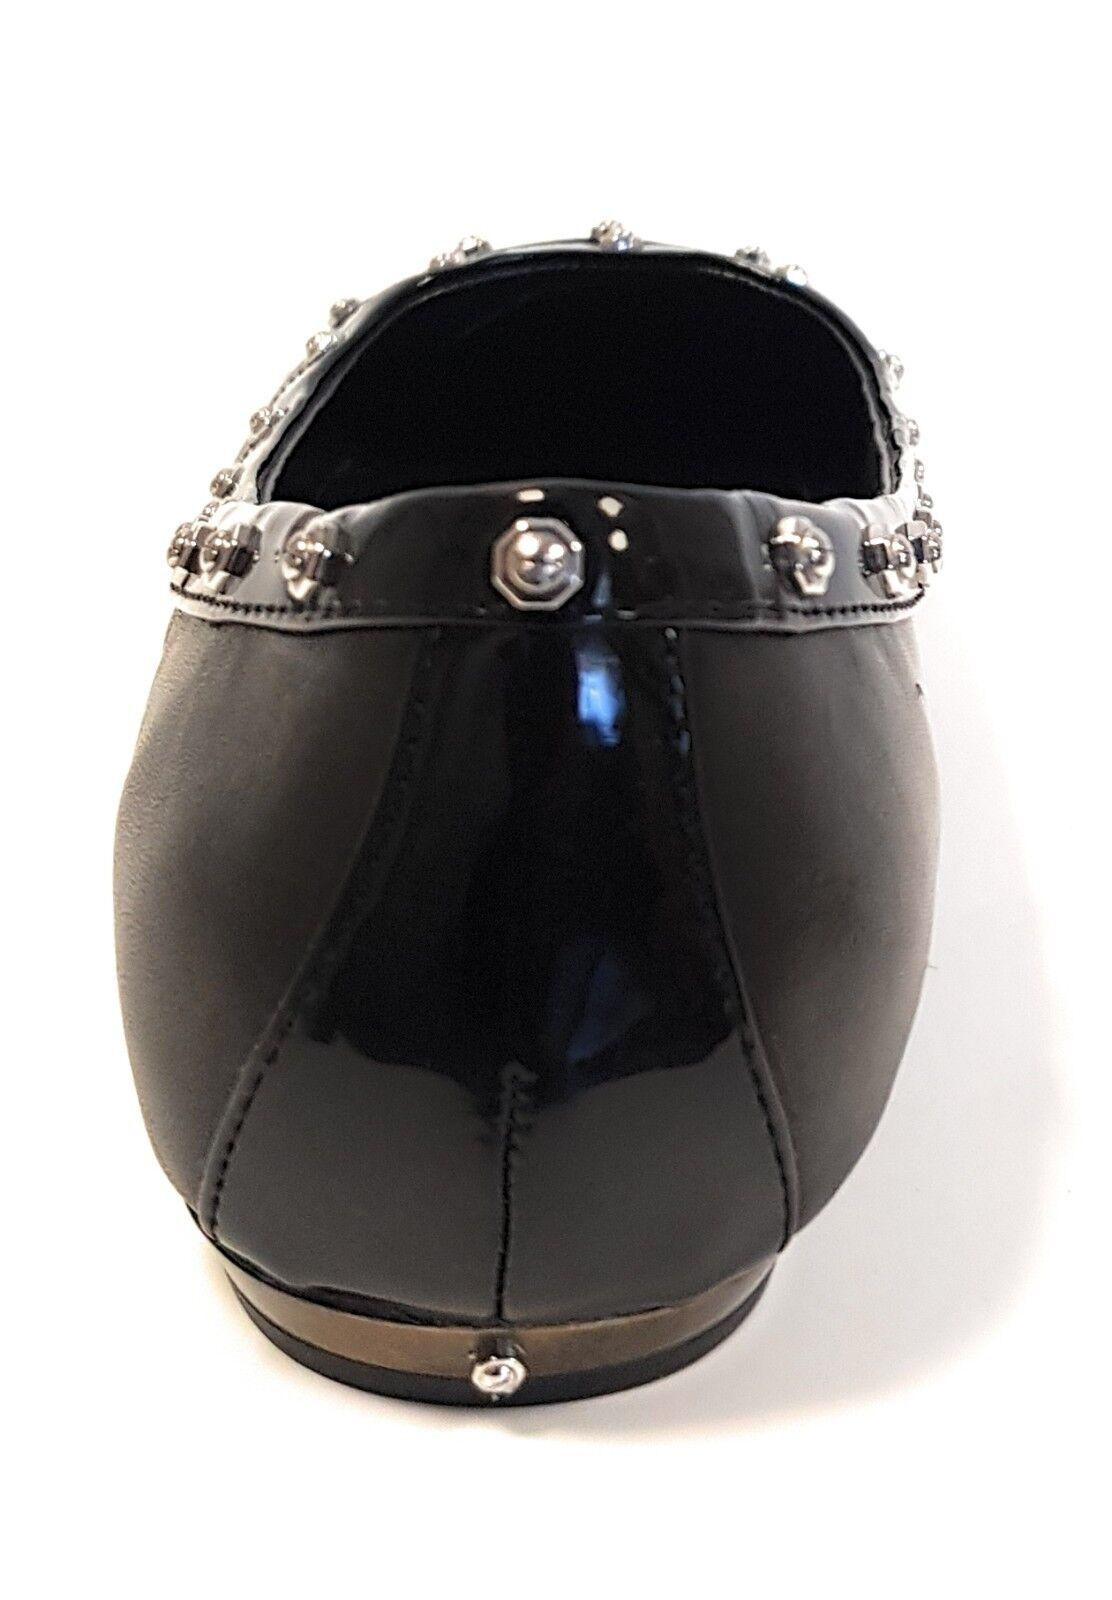 DIESEL Ballerina CAGE Damen D-LIGHTS D Y01135 PR013 T8013 Echtleder Damen CAGE Schuhe Z2 14b14c